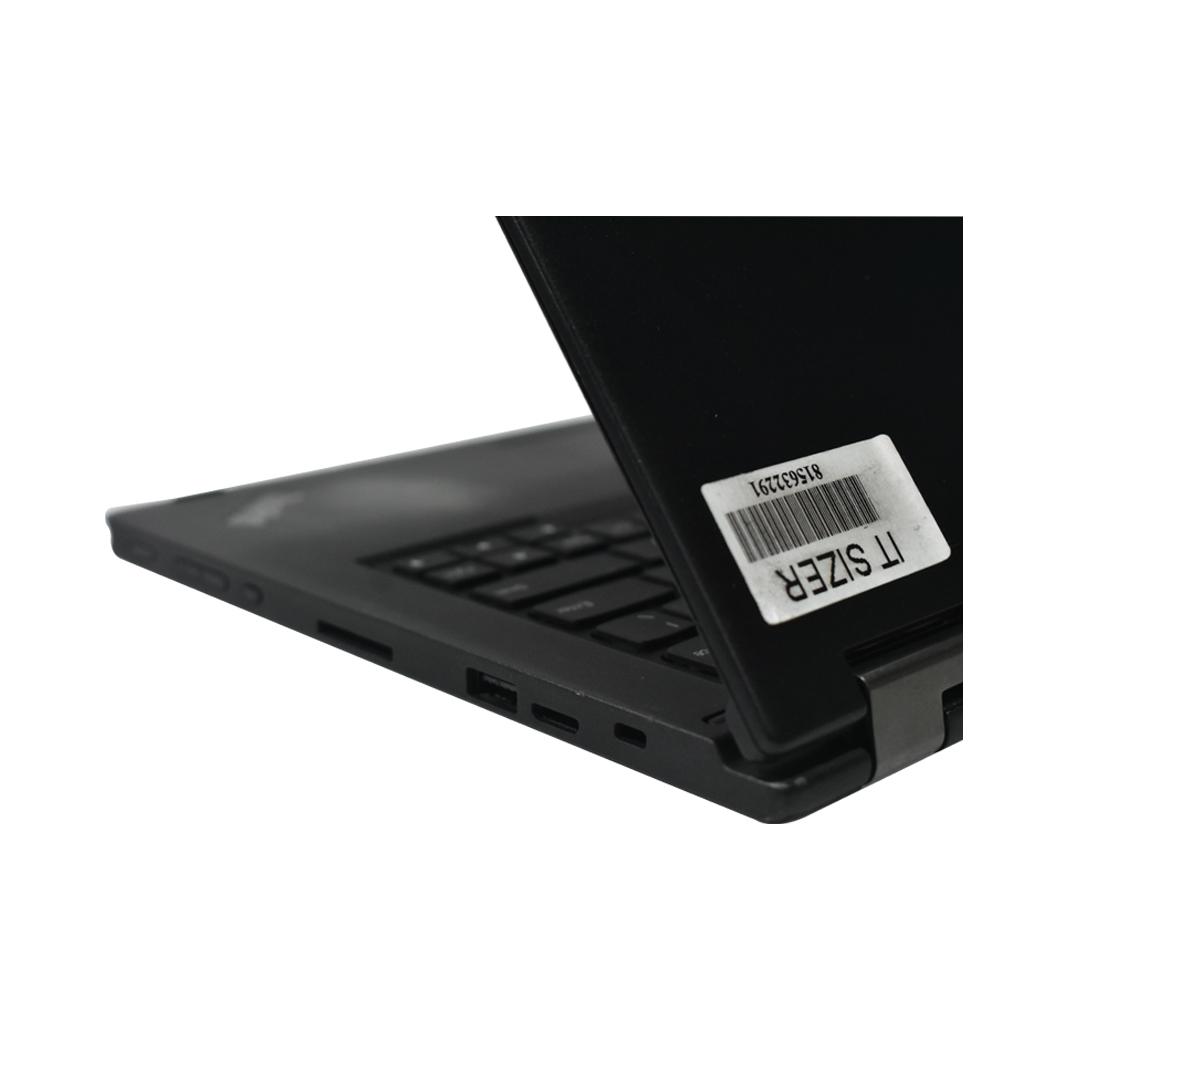 Lenovo Thinkpad yoga 12 Business Laptop, Intel Core i5-5300u CPU, 8GB DDR3 BUILTIN RAM, 256GB SSD 2.5, 12 inch Touch 360 Display, Windows 10 Pro (Refurbished)